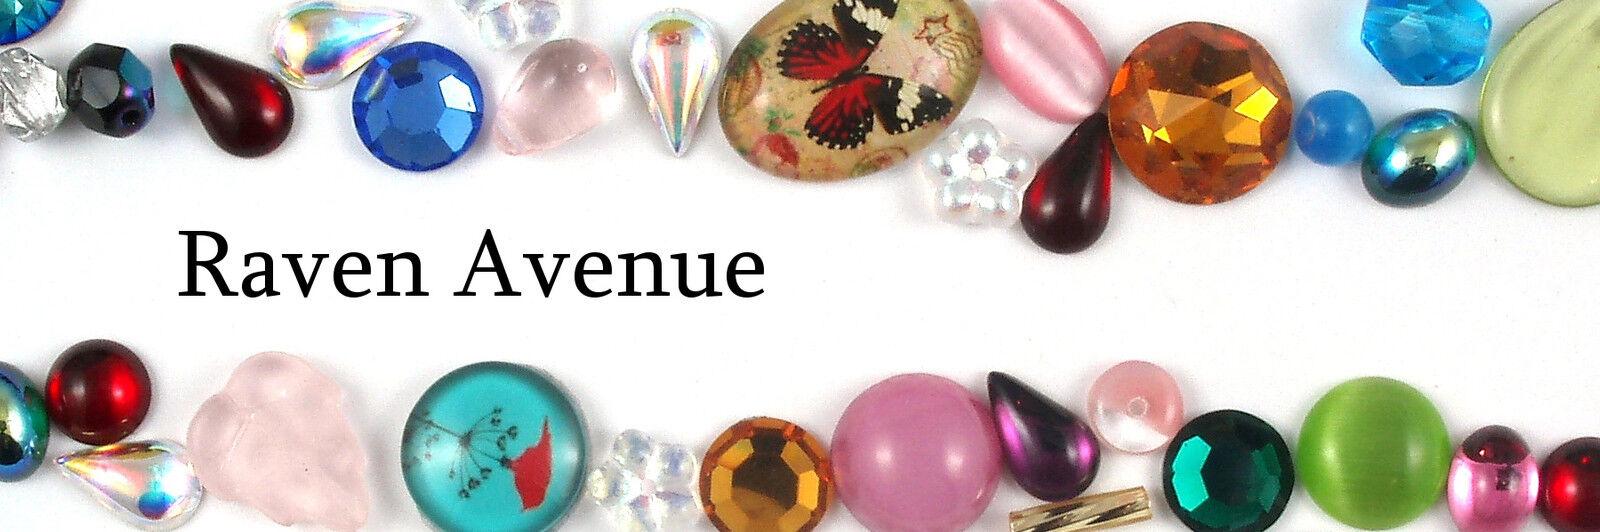 Raven Avenue Beads